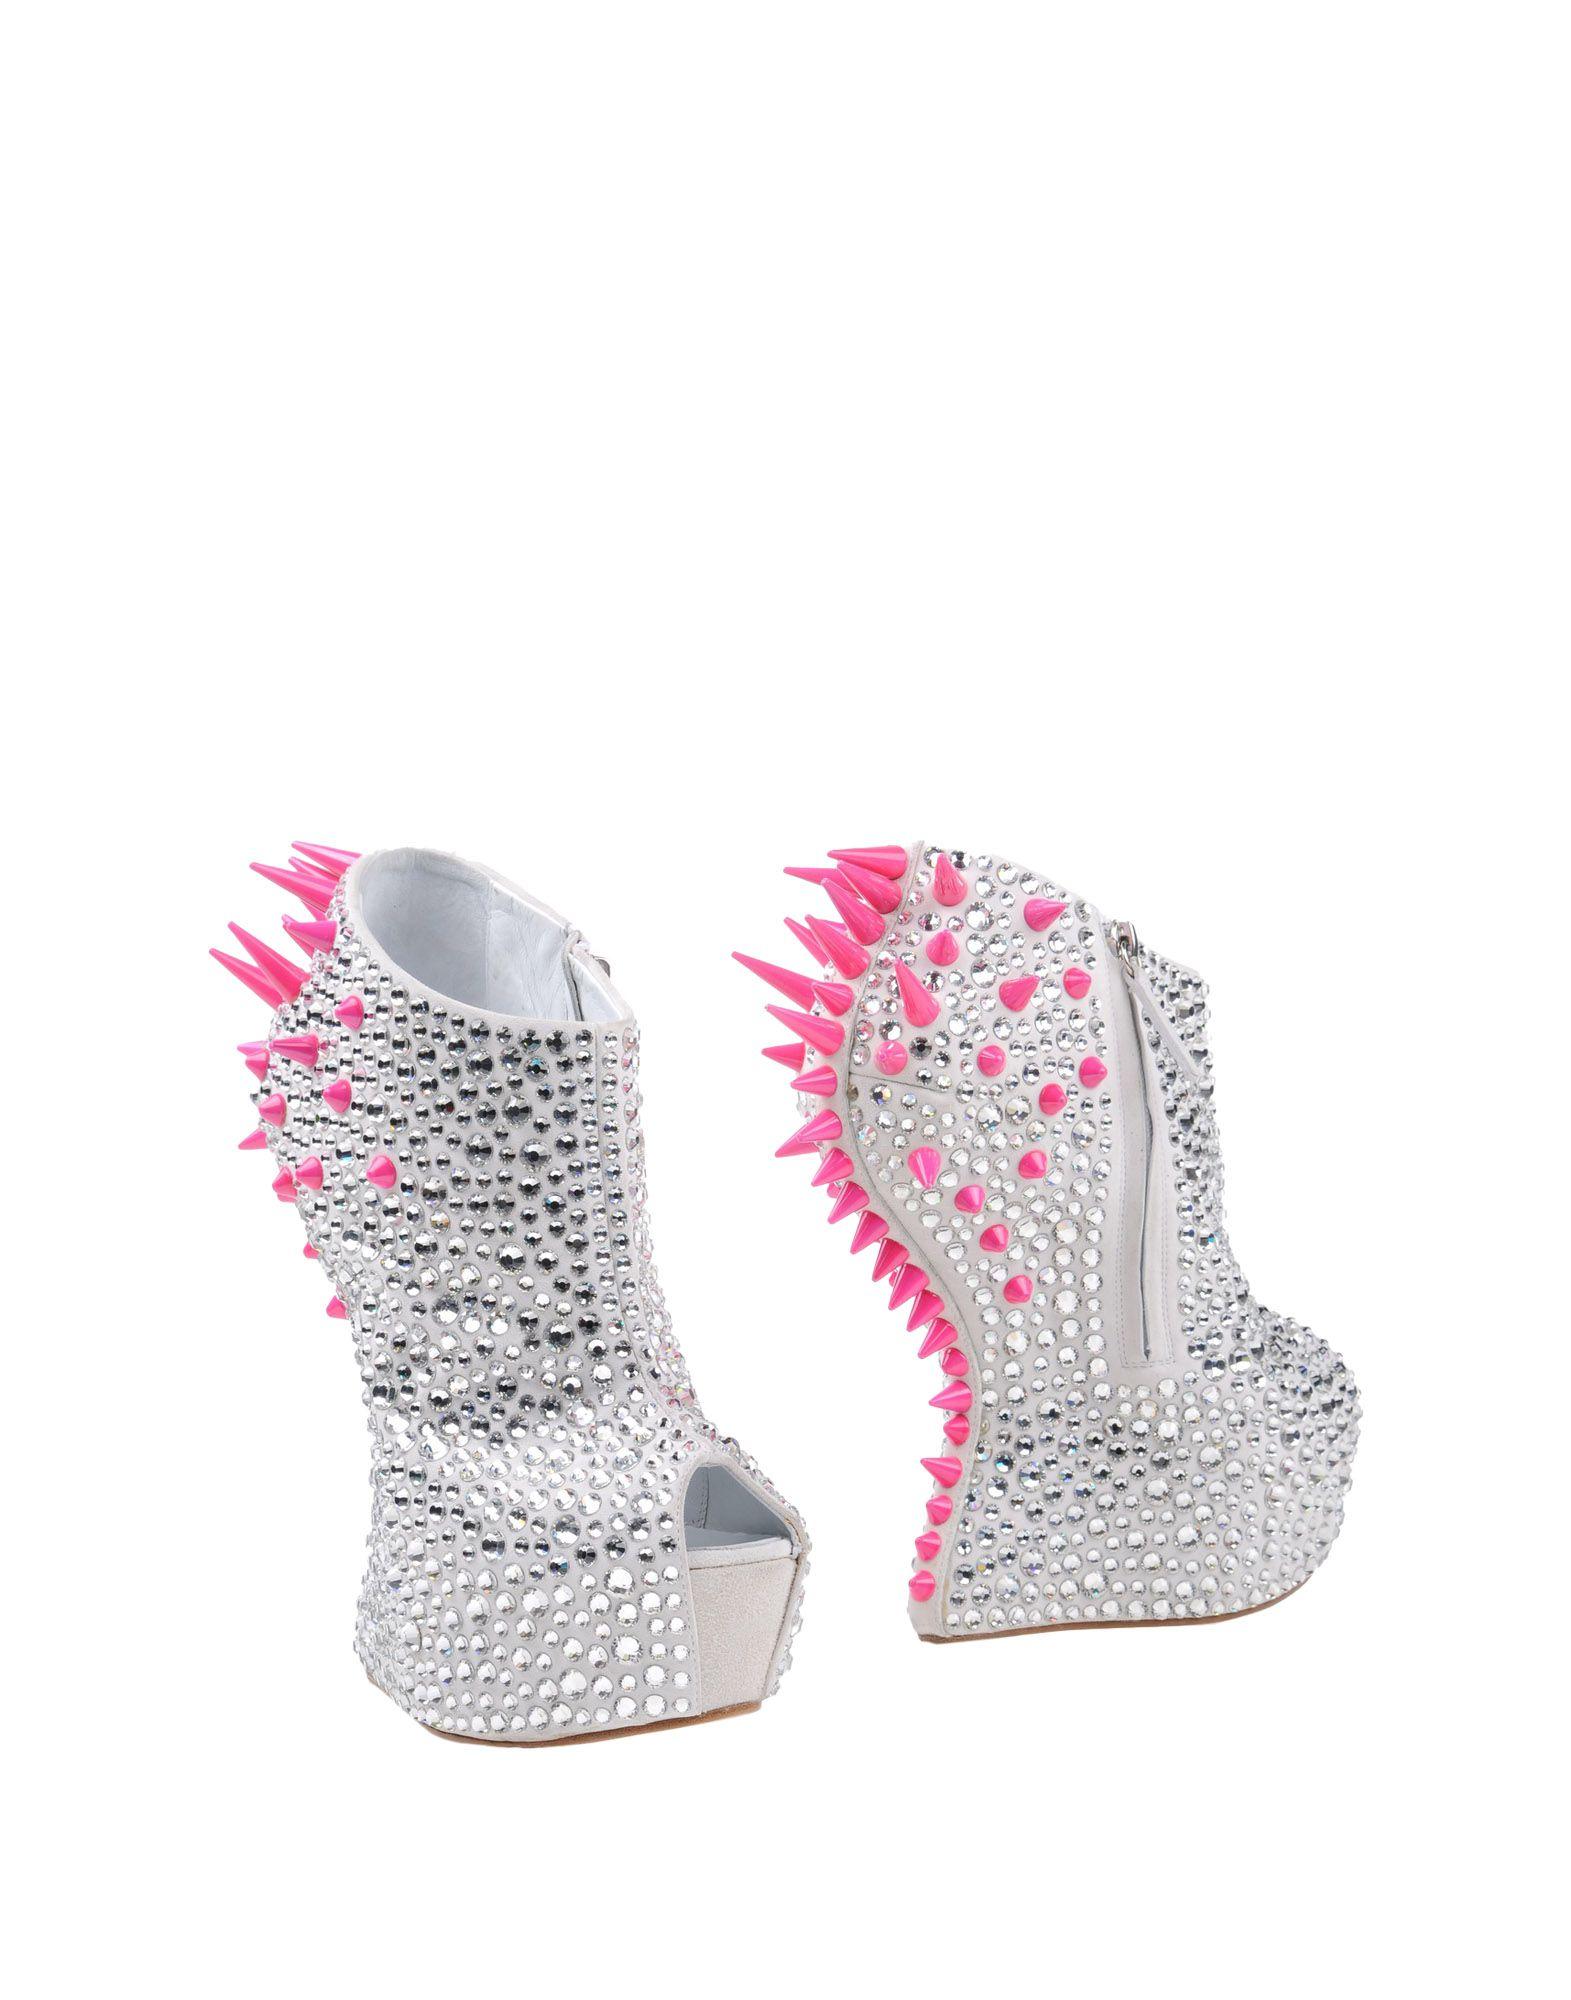 Giuseppe Zanotti Stiefelette aussehende Damen  11361971DKGünstige gut aussehende Stiefelette Schuhe 3ca904